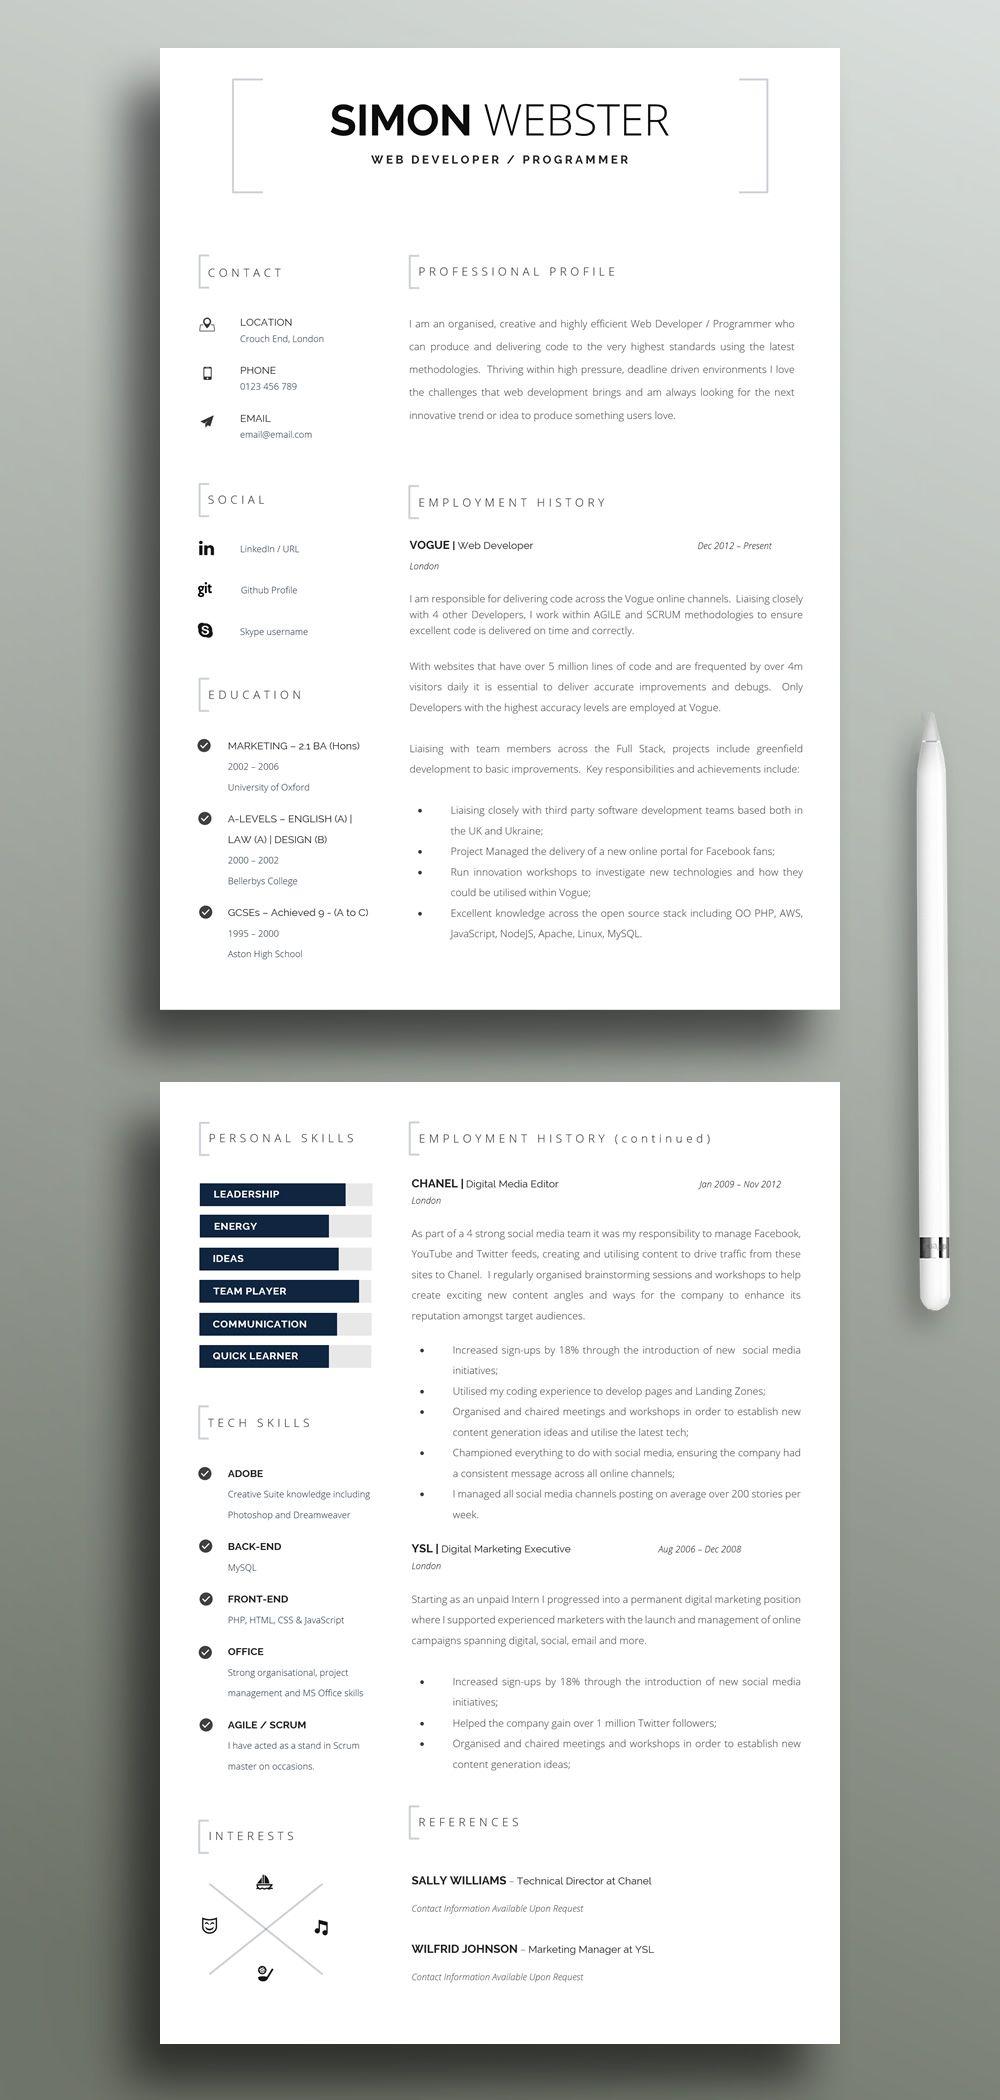 Non Chronological Chronological resume, Chronological